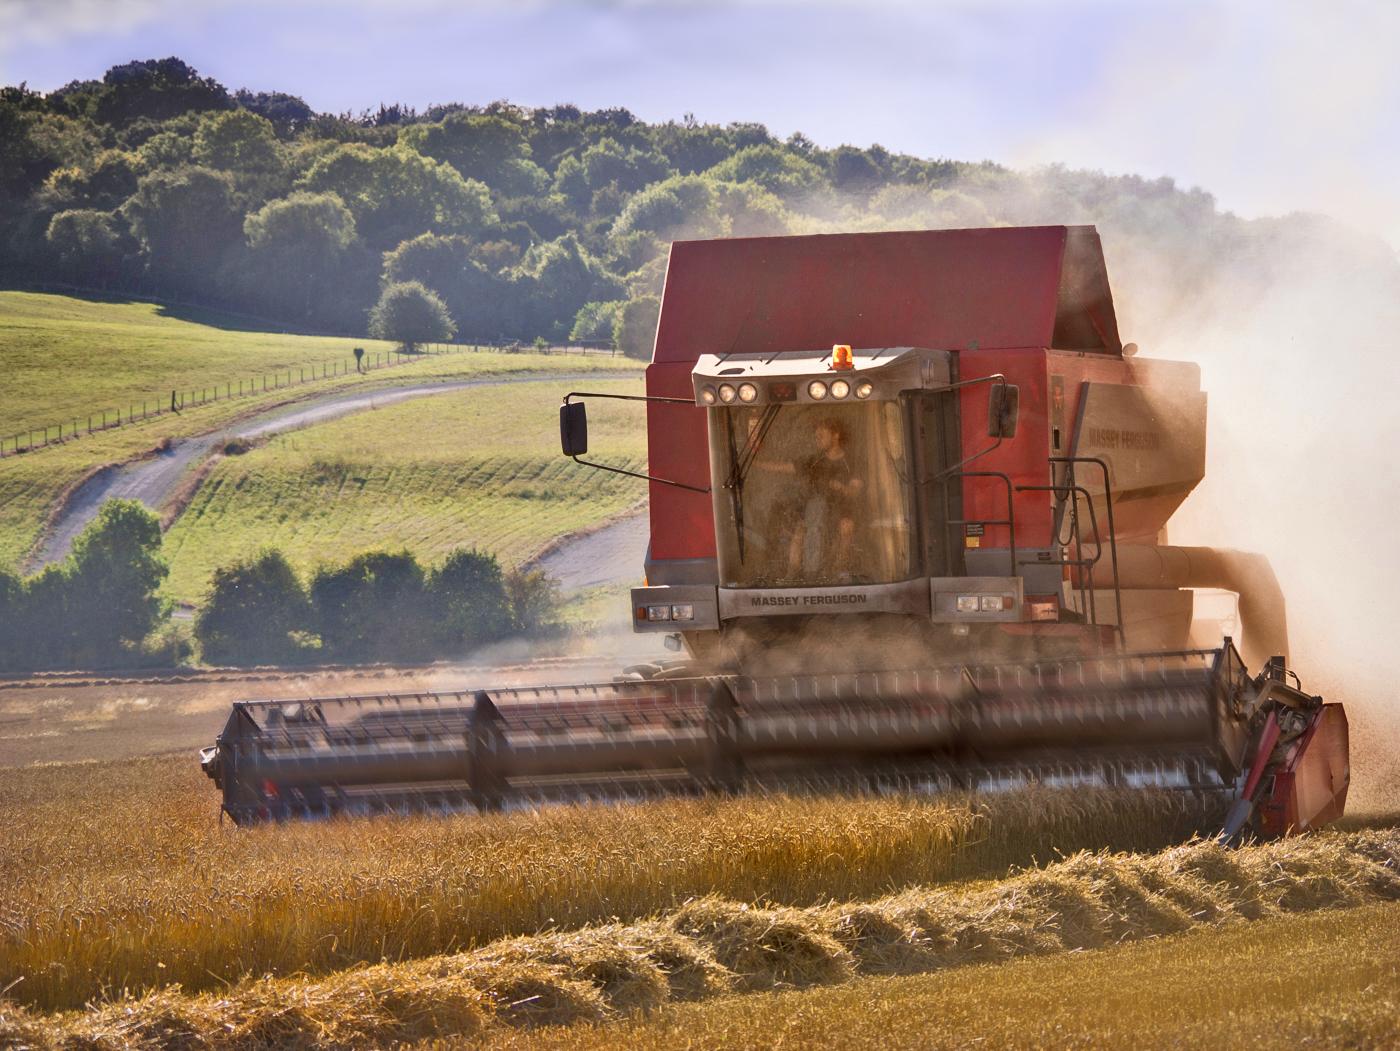 'Harvest' by Ian Porter